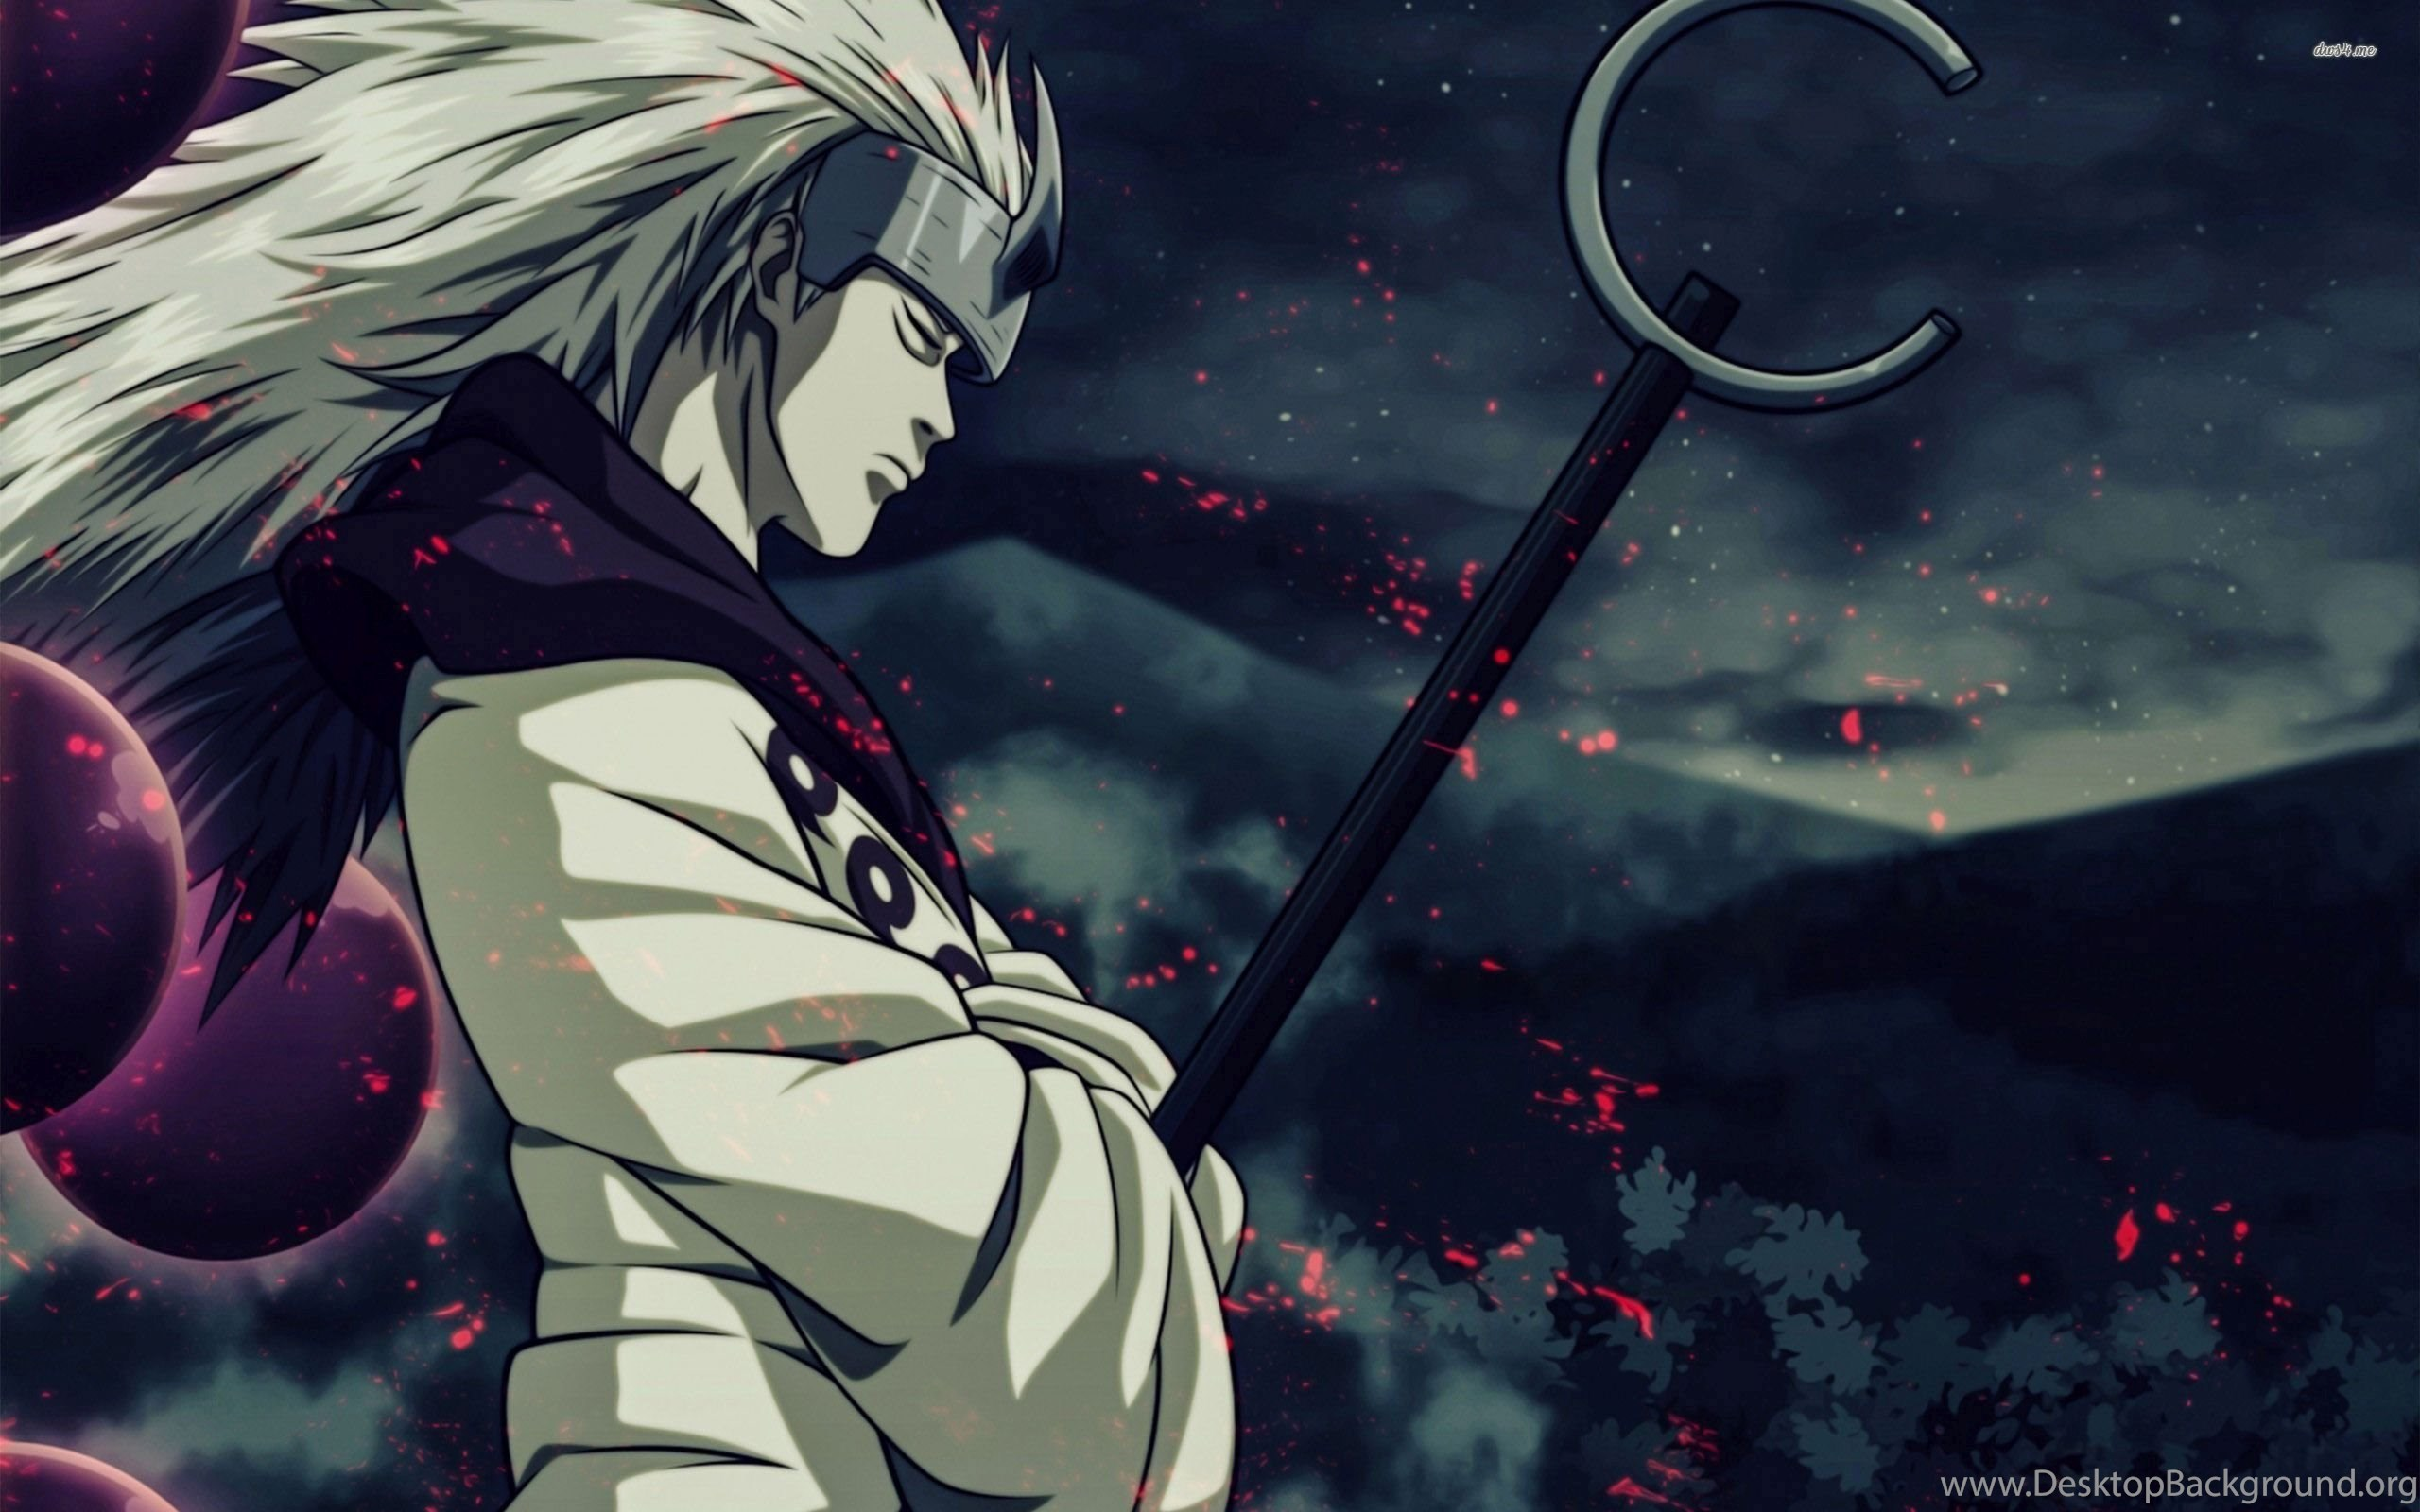 Best Wallpaper Naruto Top - 14405_top-hd-naruto-wallpapers_2560x1600_h  HD.jpg